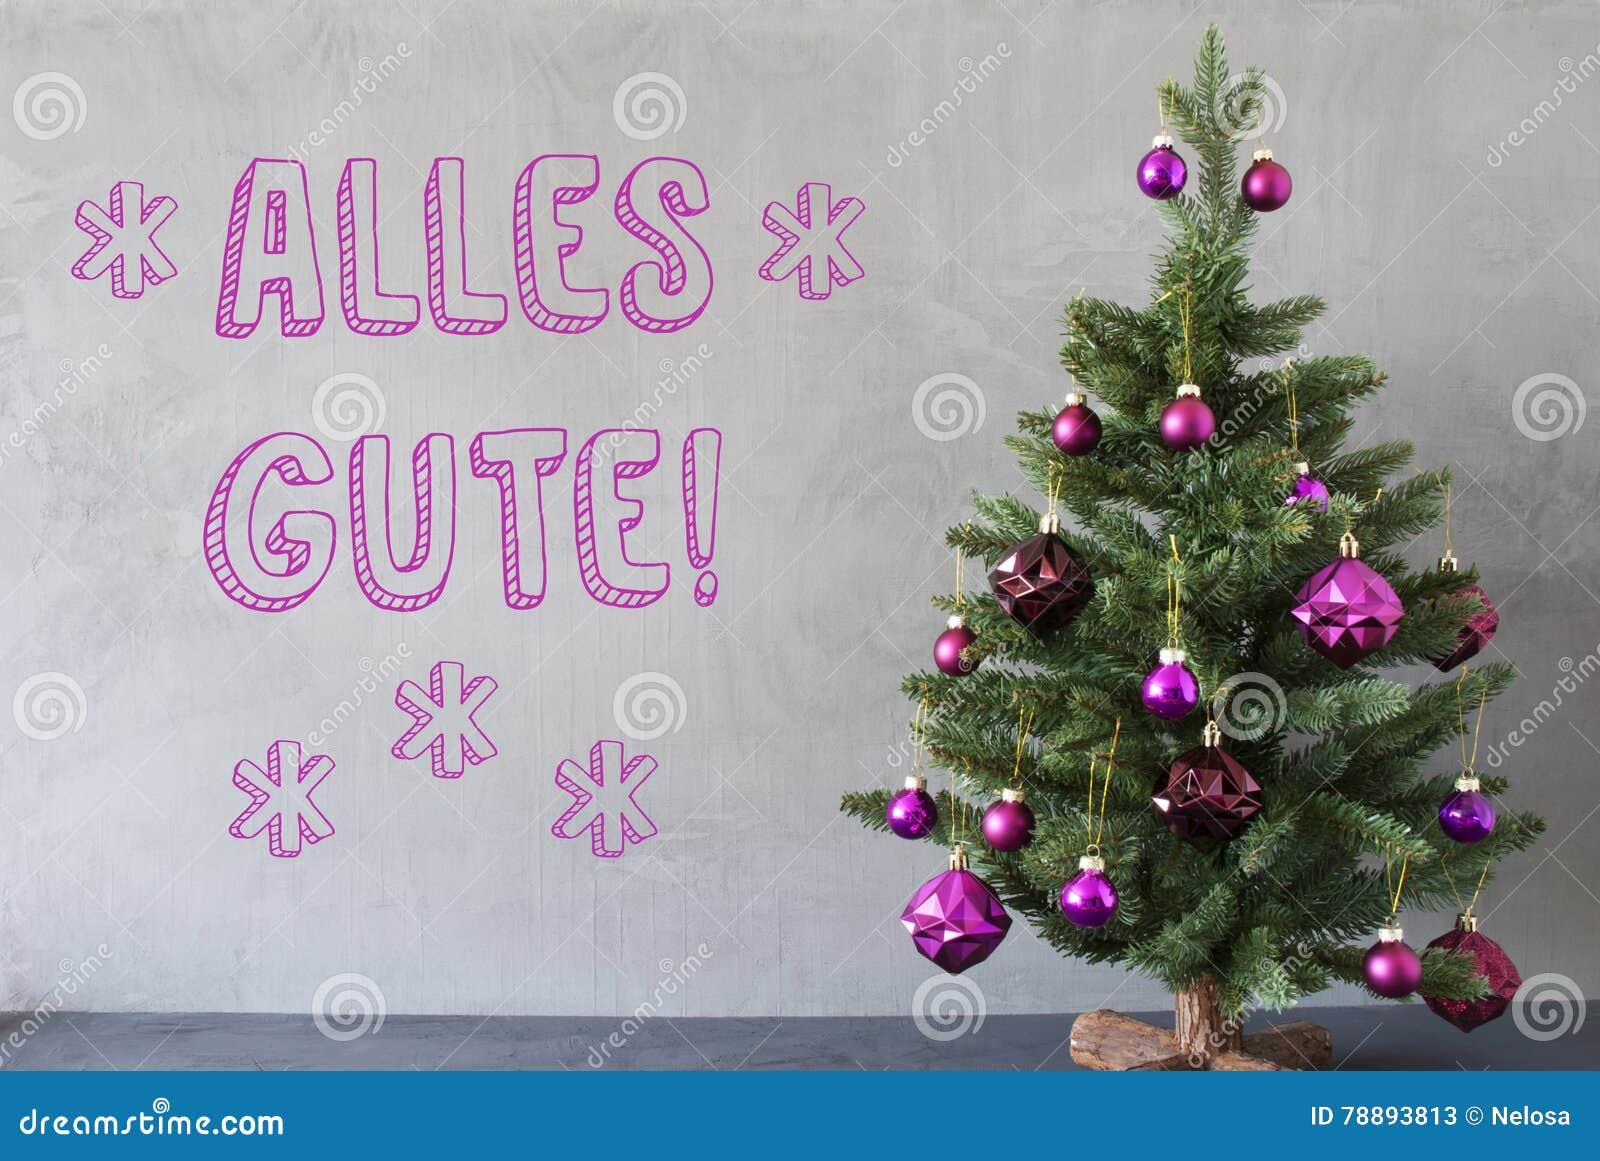 Weihnachtsbaum Der Guten Wünsche.Weihnachtsbaum Zement Wand Alles Gute Bedeutet Beste Wünsche